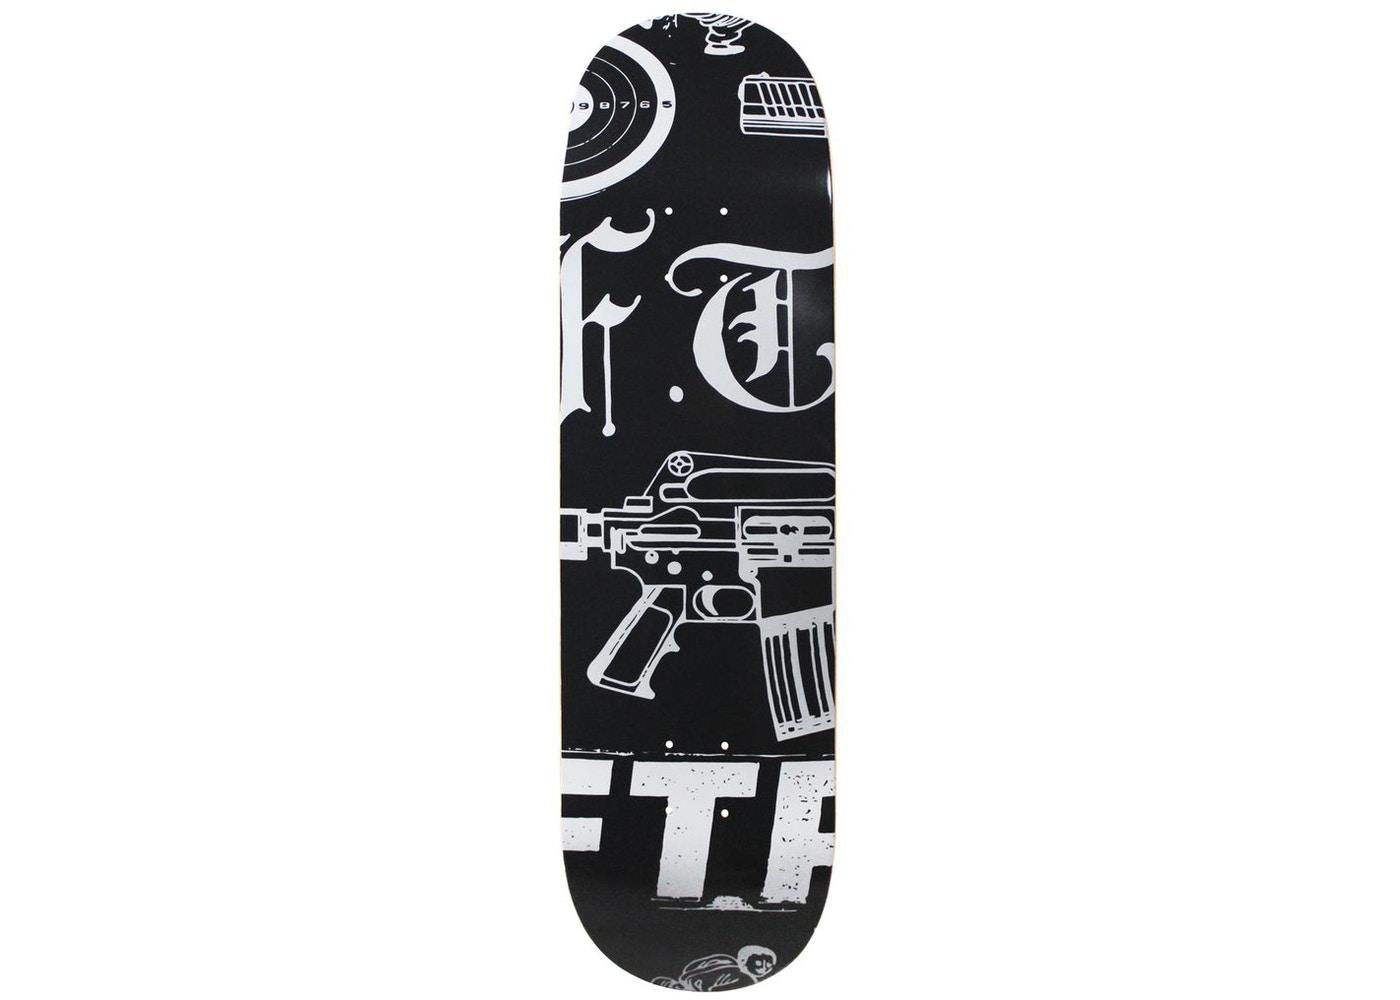 96ed24a9 FTP Psycho Skateboard Deck Multi - SS19